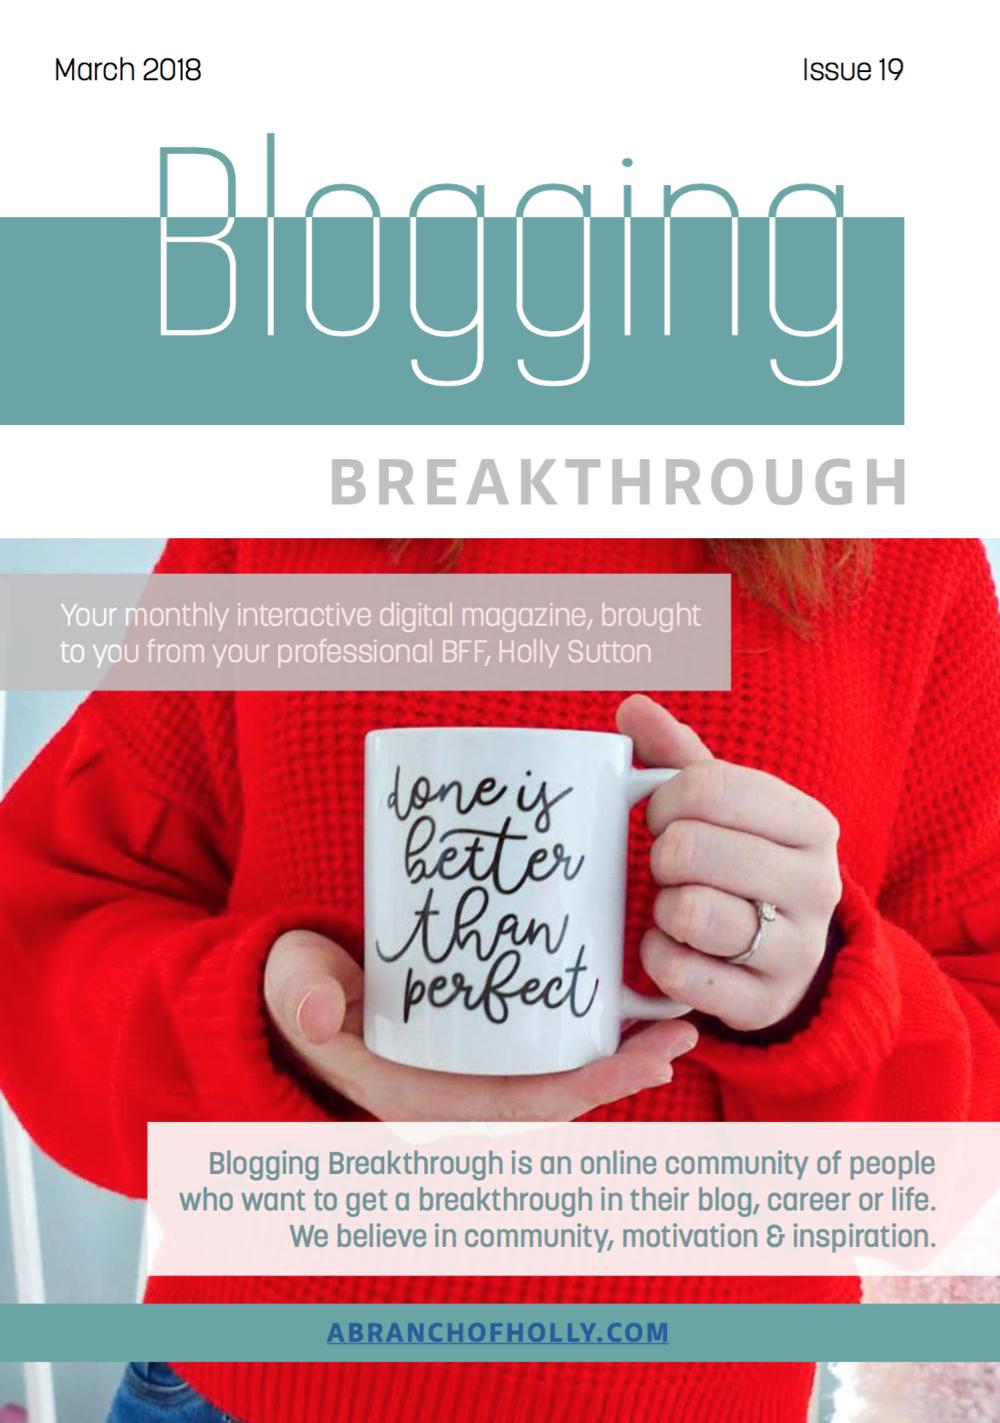 blogging breakthrough march 2018 issue 19